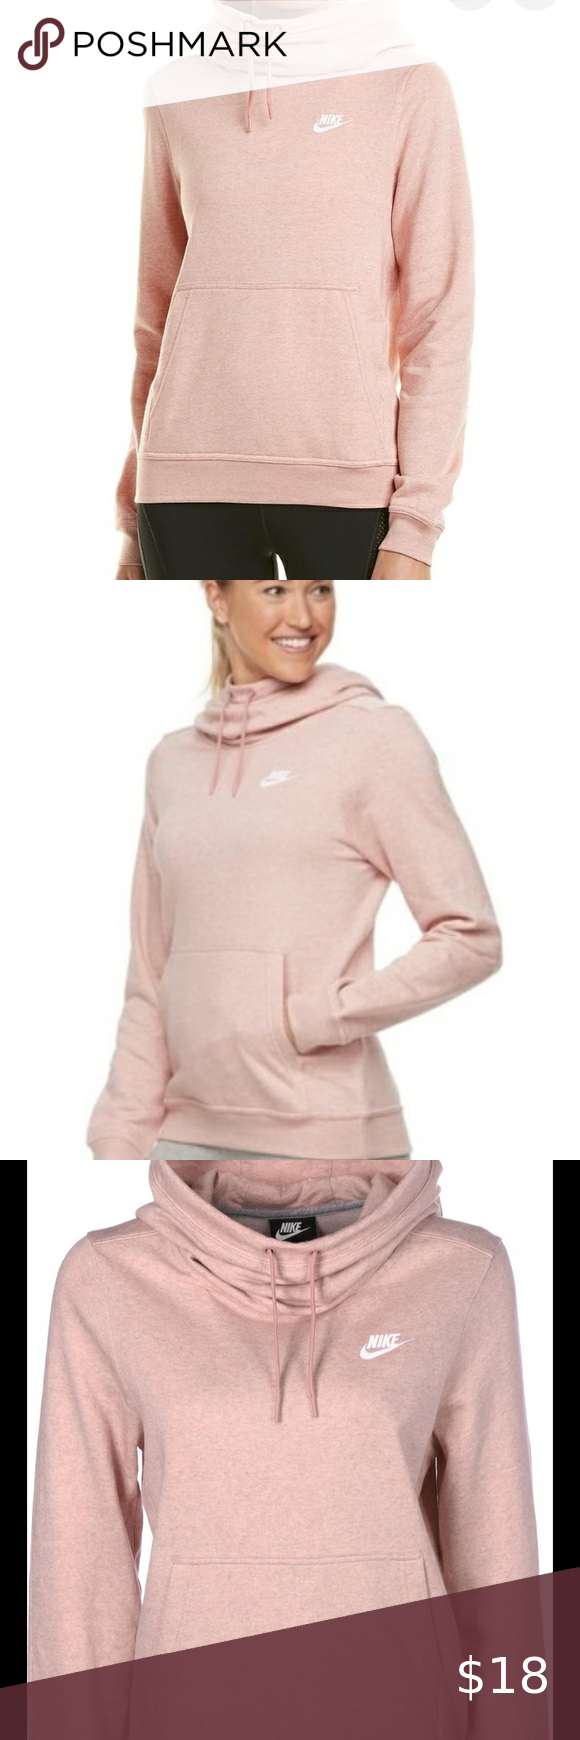 Nike Funnel Neck Hoodie Nike Funnel Neck Hoodie Funnel Neck Hoodie Nike Women [ 1740 x 580 Pixel ]